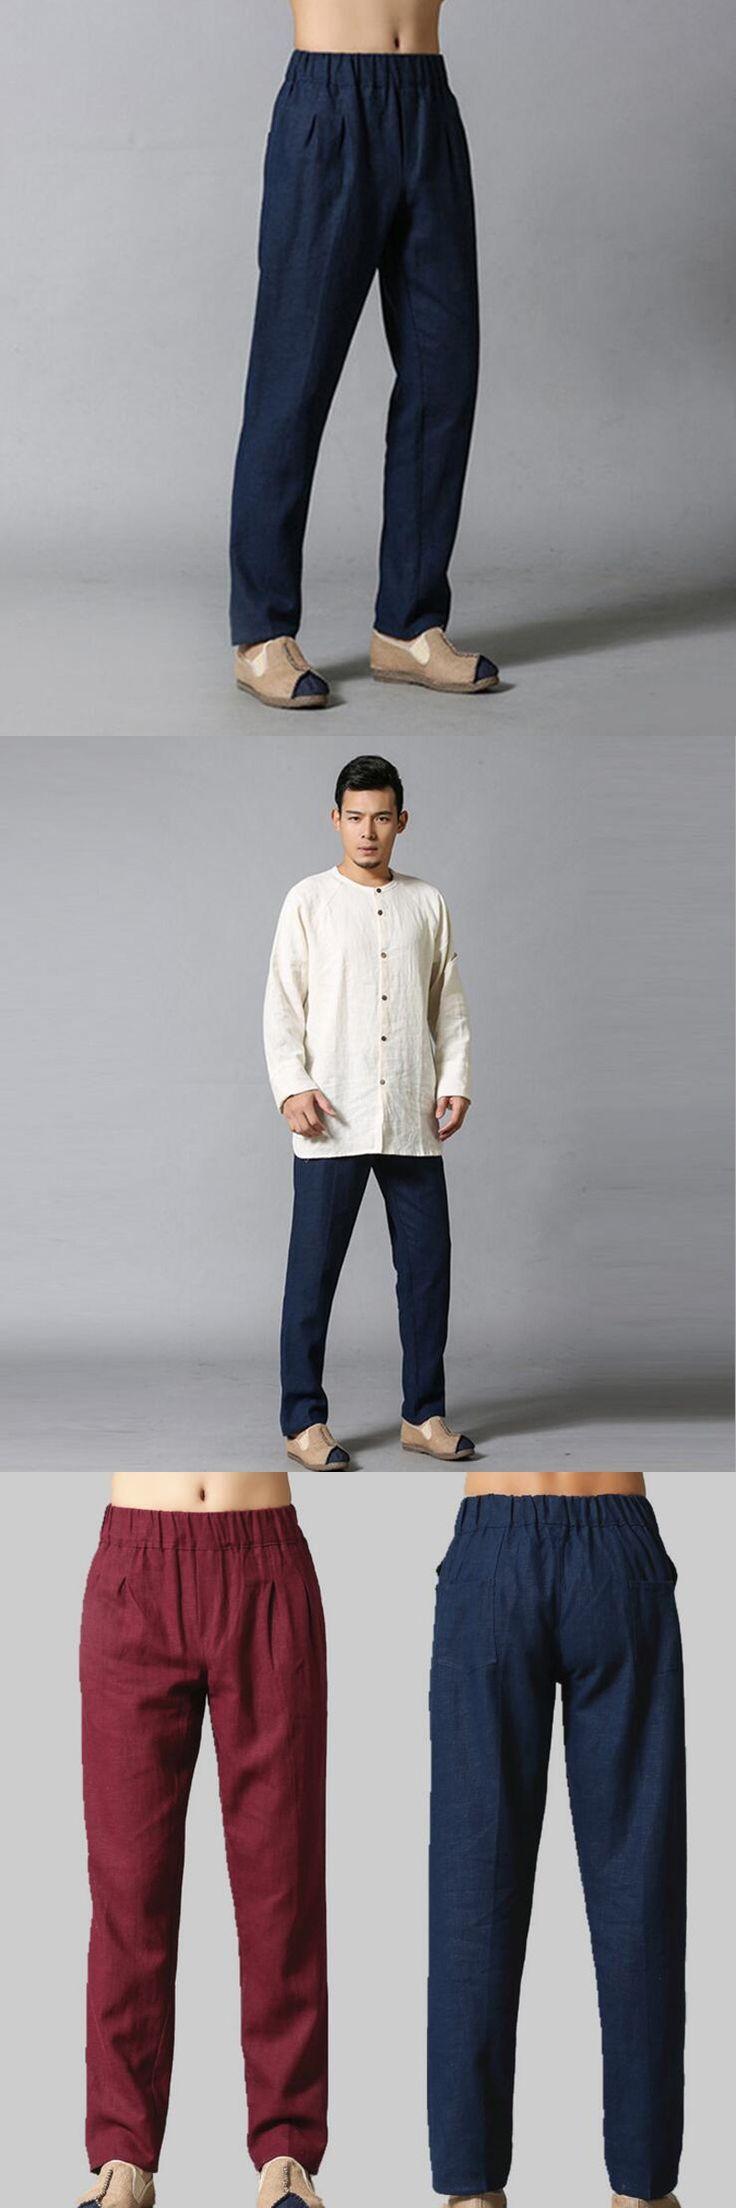 One Size Cotton Linen Pants Comfortable Men Casual Linen Trousers Men Soft Natural Flax All Match Pants Two Pockets 4Colors